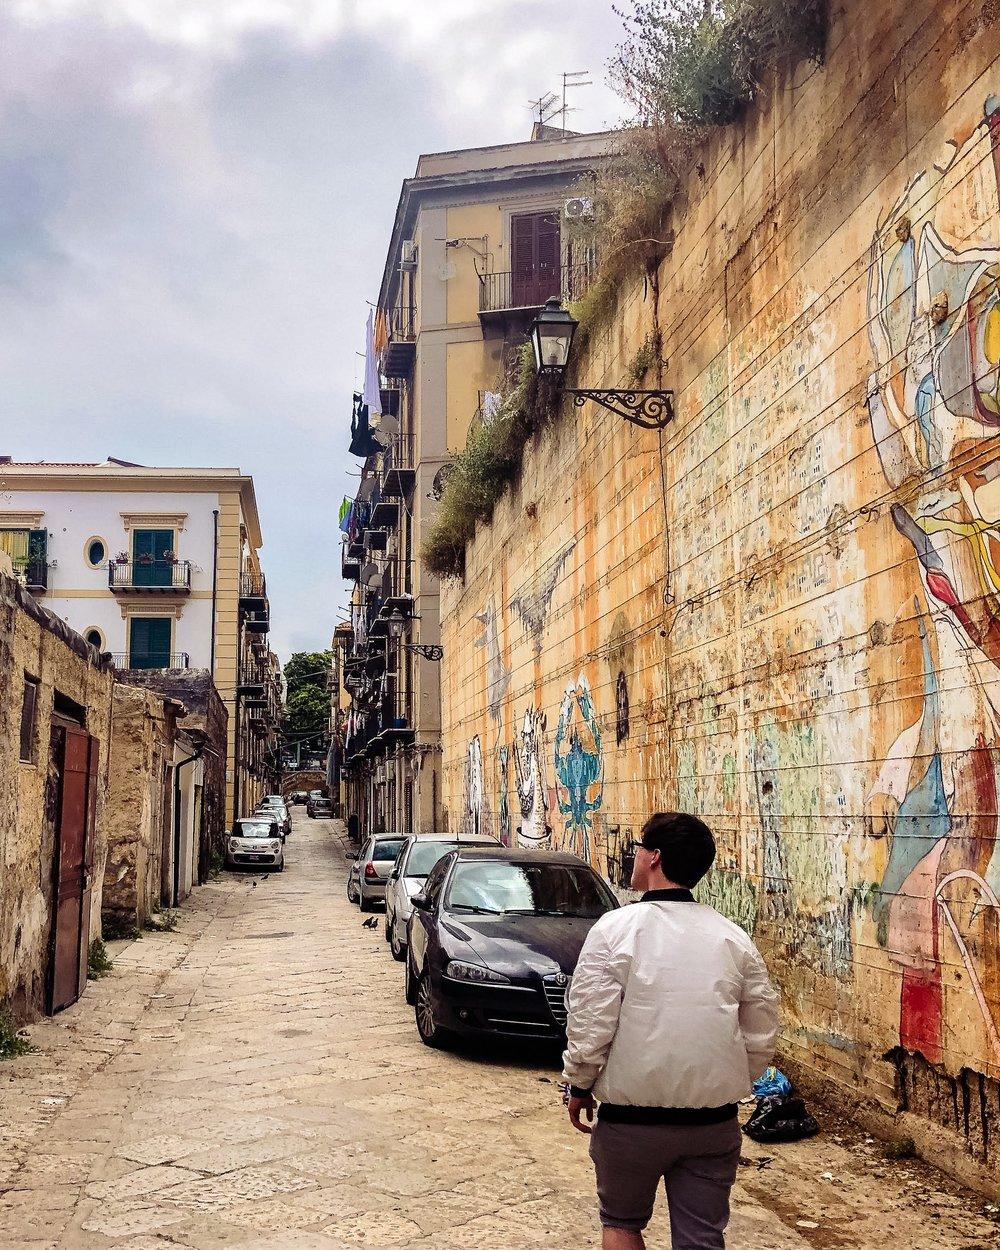 2018-05-27 Sicily-7 - Copy.jpg